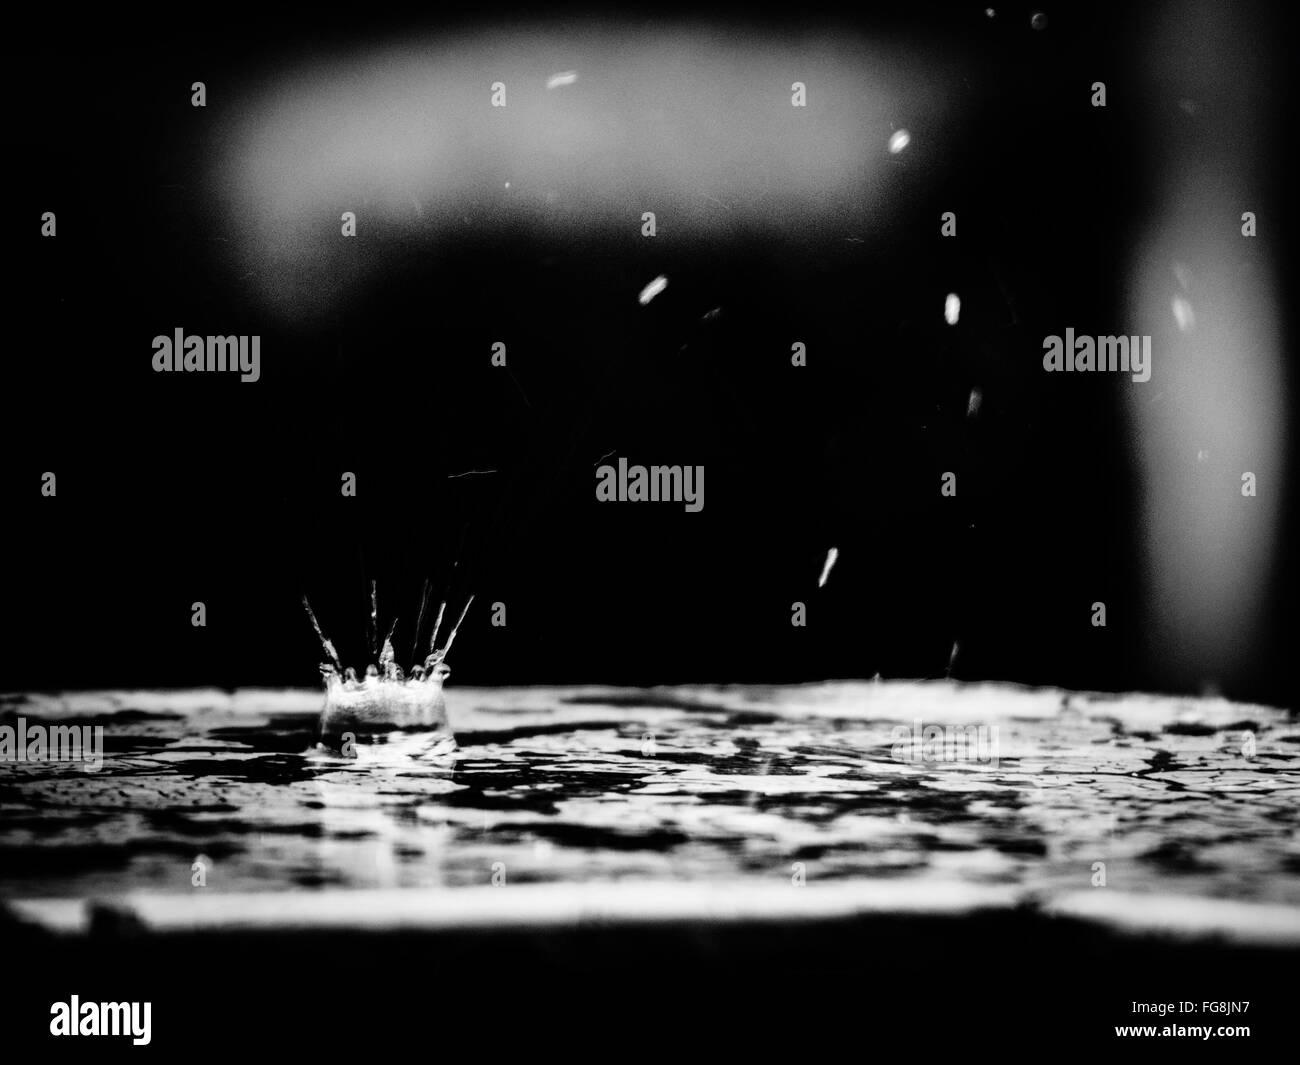 Primer plano de salpicaduras Droplet en Charco Imagen De Stock